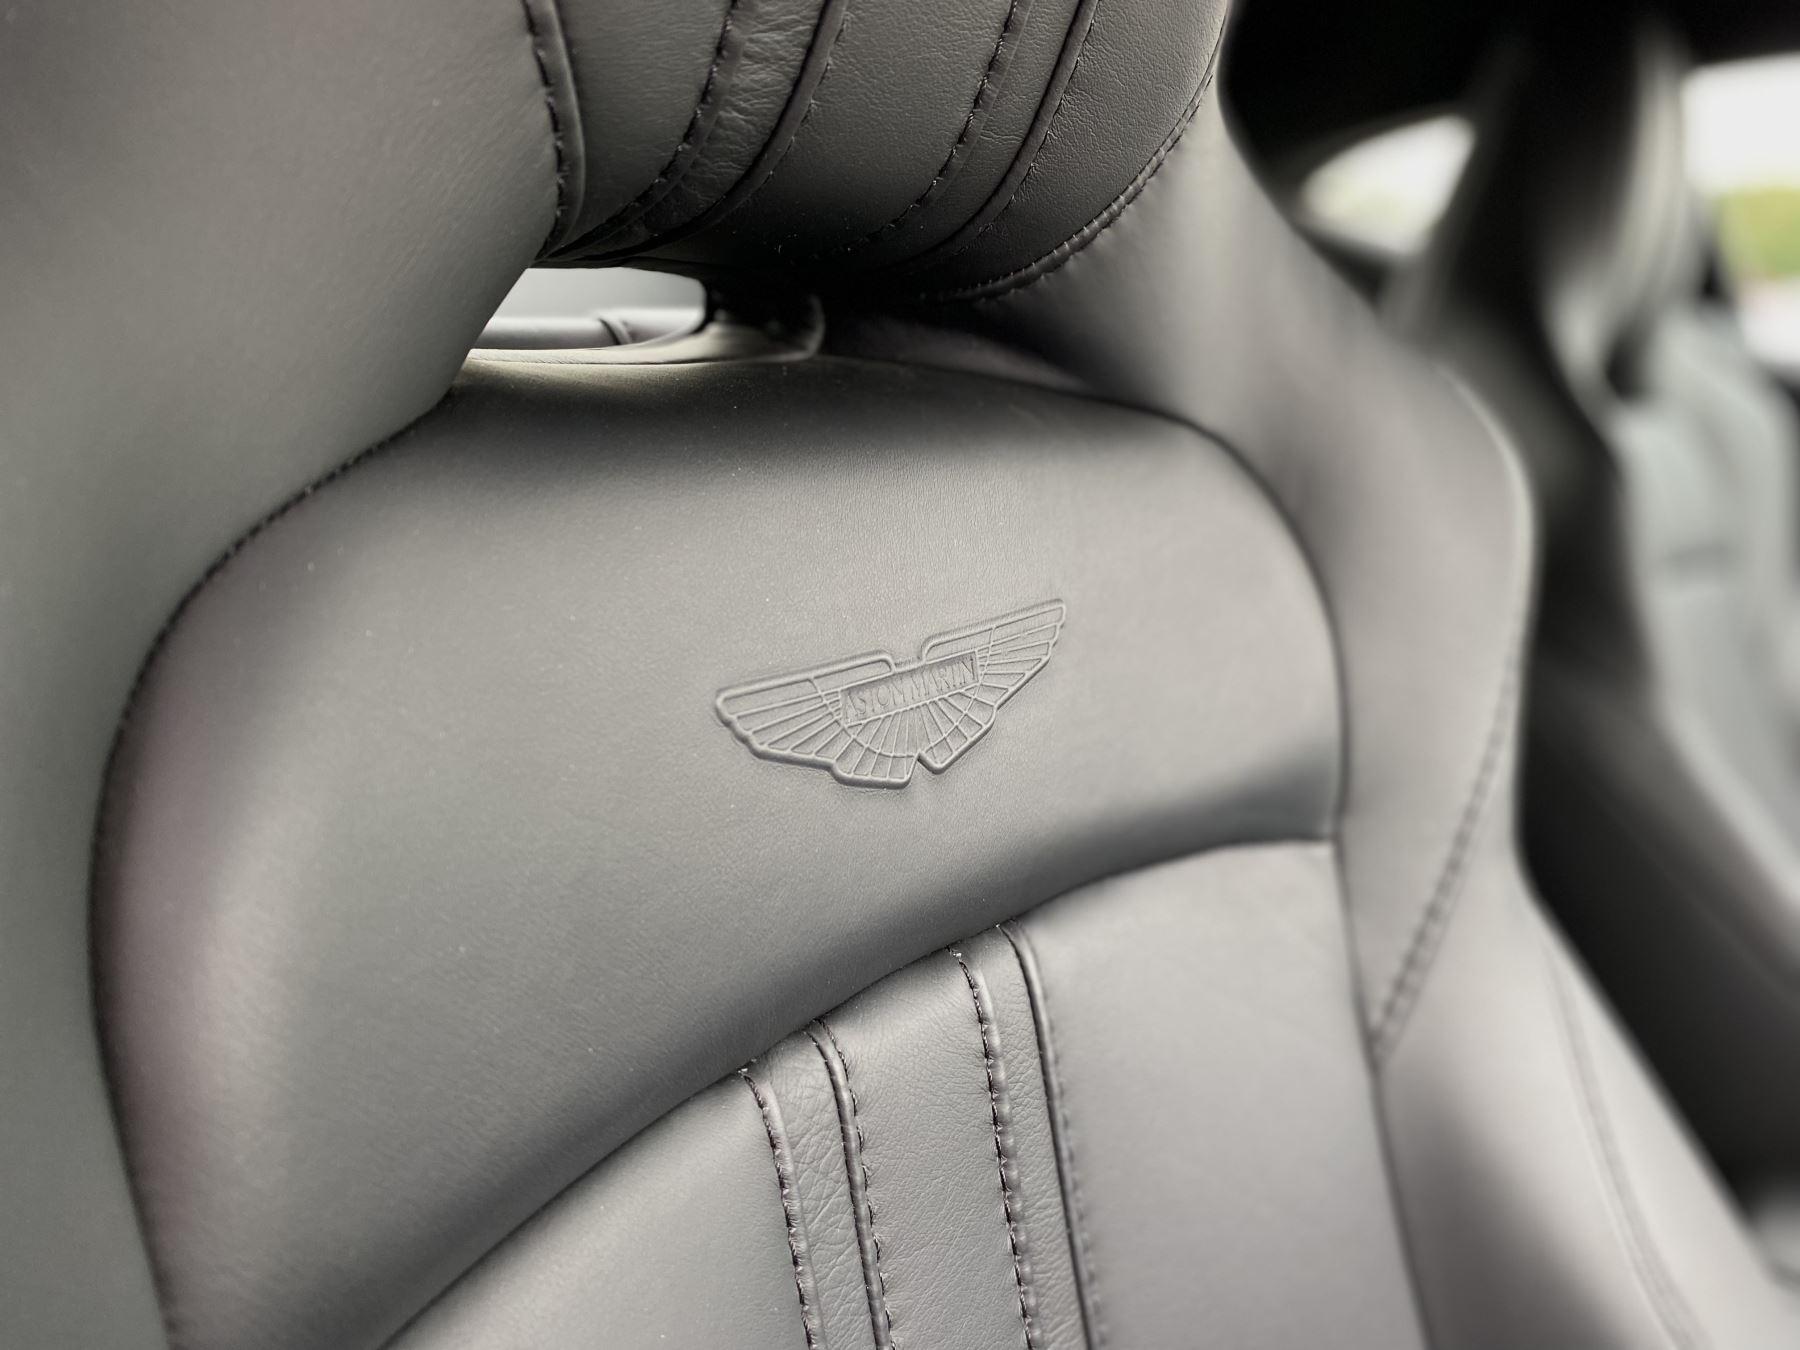 Aston Martin New Vantage 2dr ZF 8 Speed Auto. 4.0 Twin Turbo ZF Gearbox  Reversing Camera Heated Seats Ceramic Brakes image 26